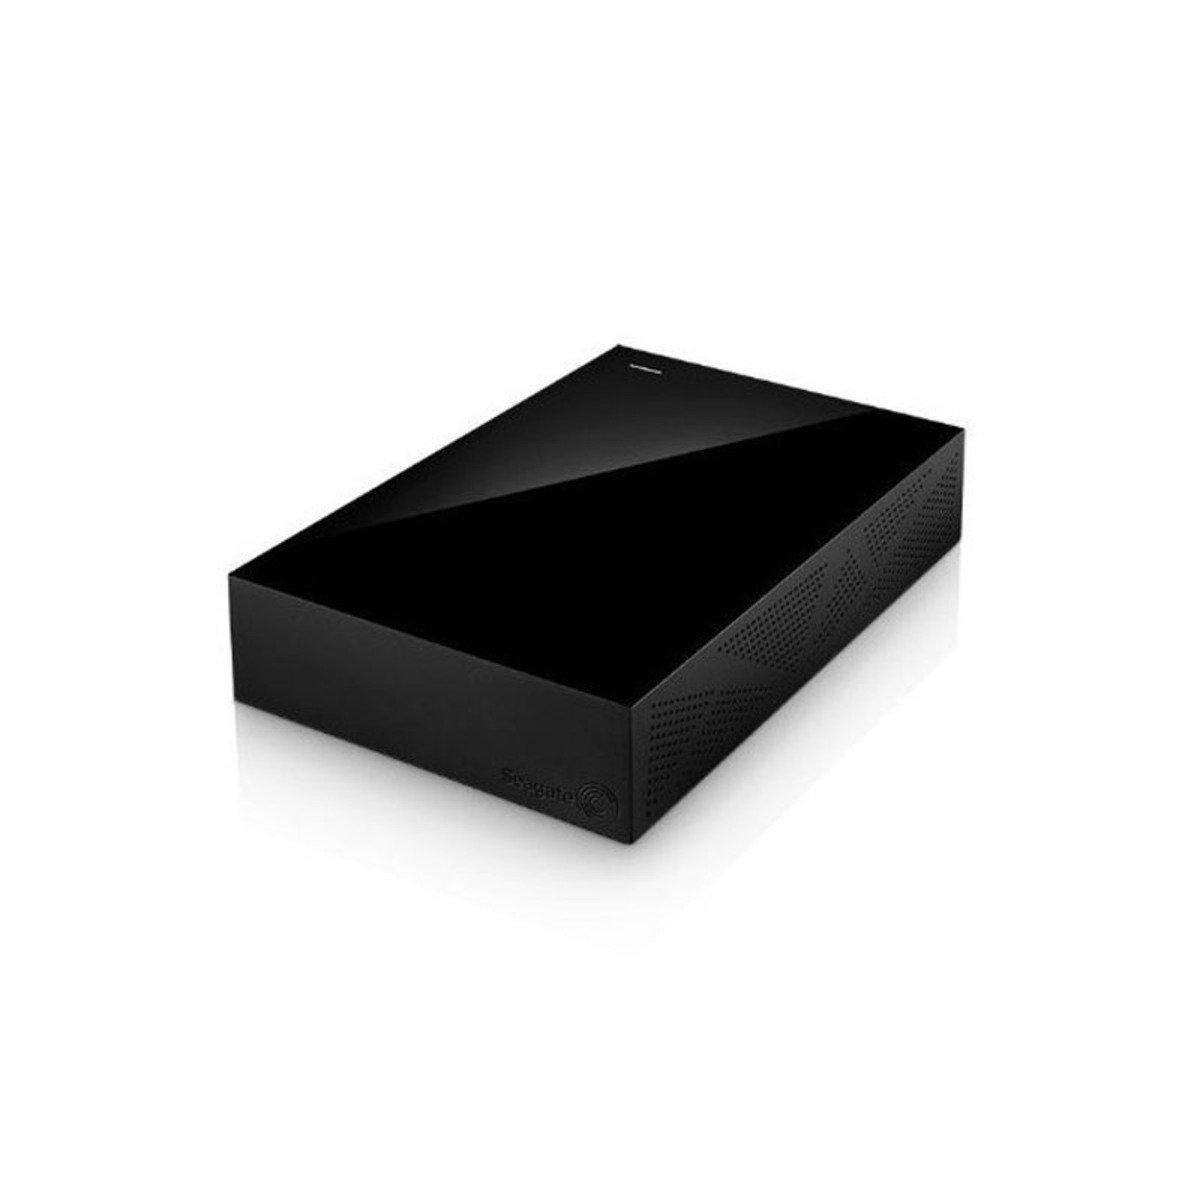 Backup Plus 3TB USB 3.0 3.5吋 外置硬碟 STDT3000300